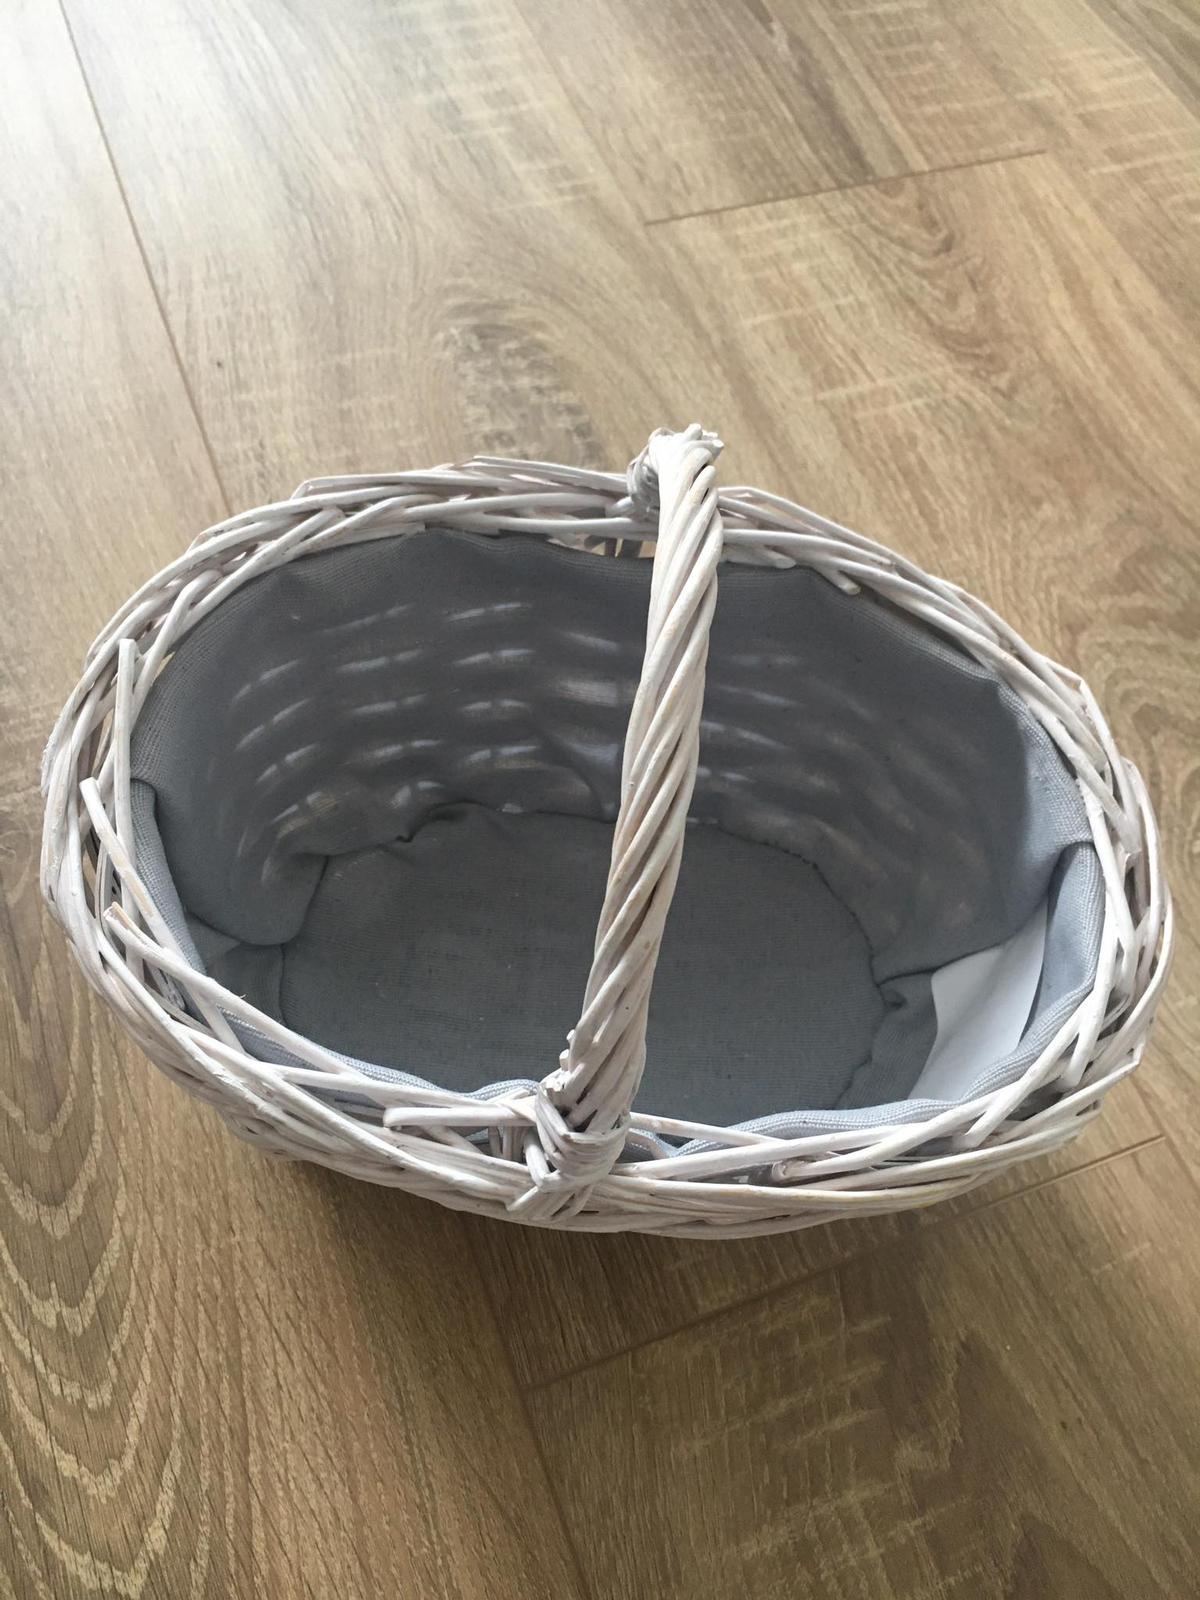 Biely košík - Obrázok č. 3